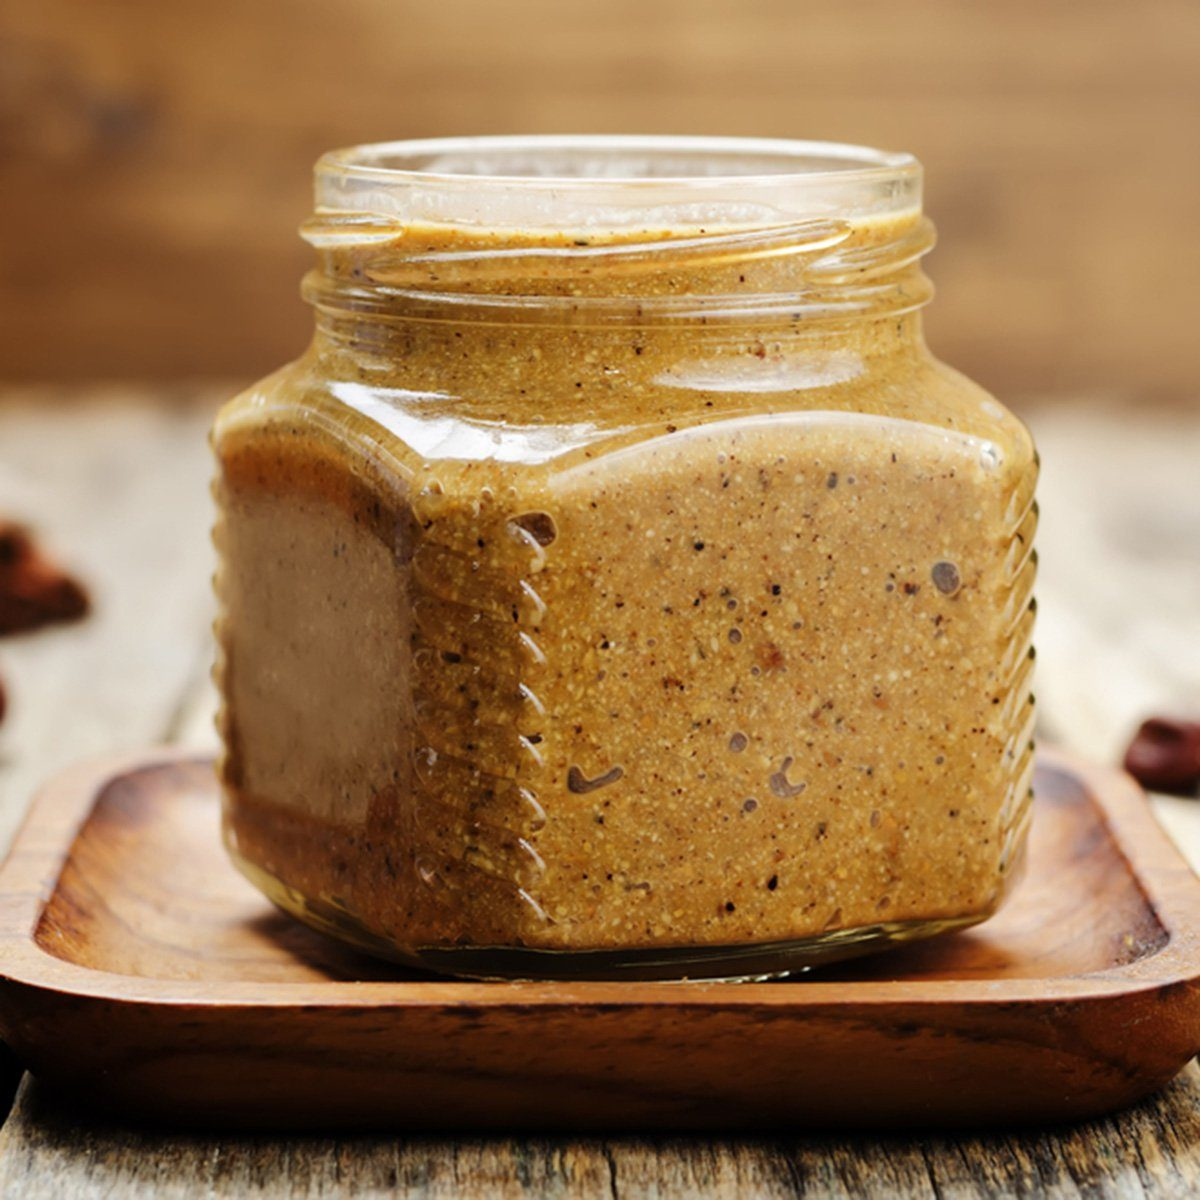 homemade toasted cinnamon hazelnut butter.